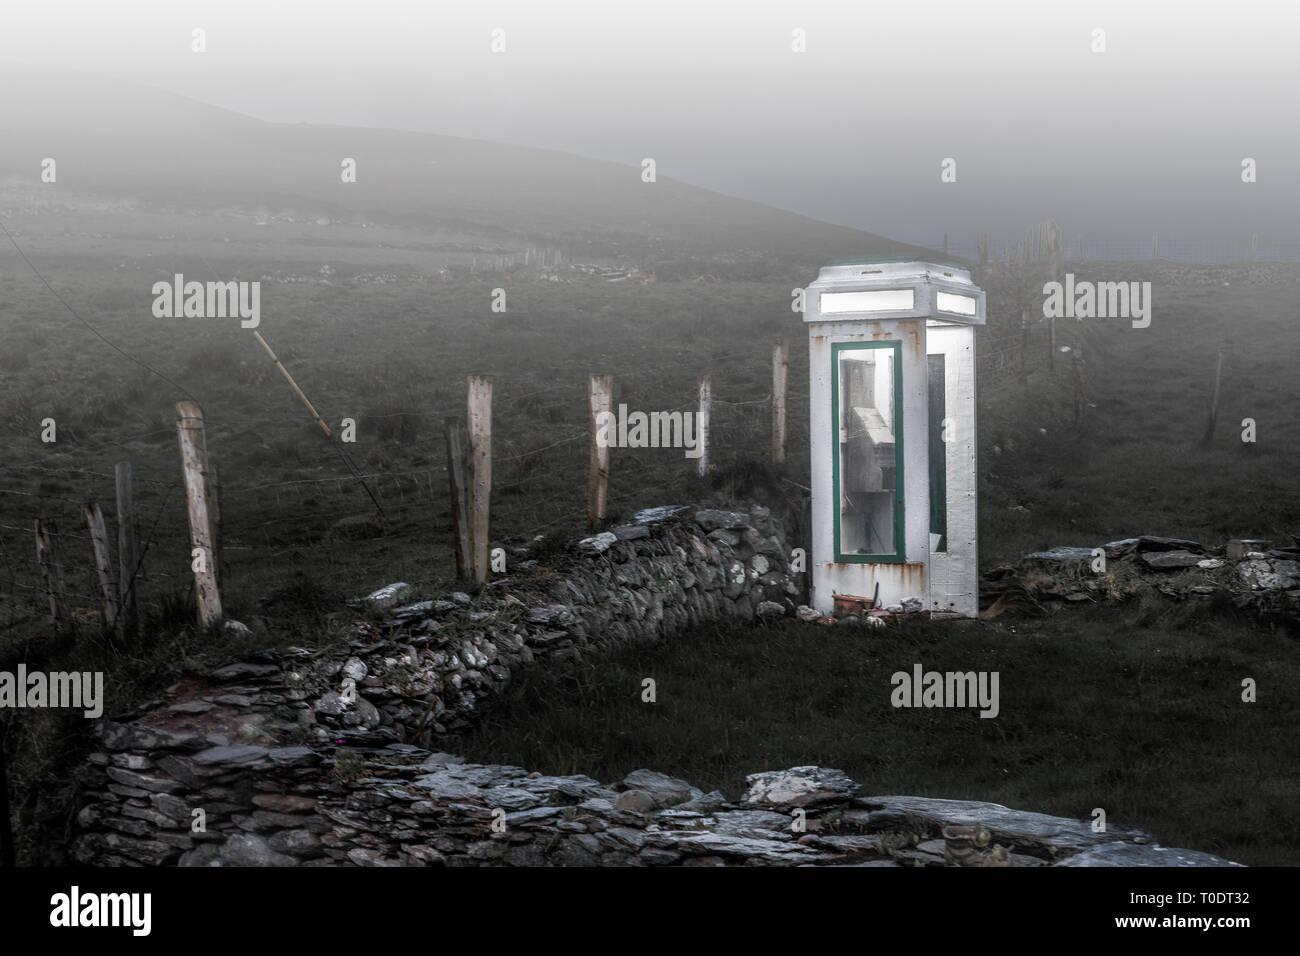 Dursey Island, Cork, Ireland. 27th April, 2015. An old disused telephone box on Dursey Island. Co. Cork, Ireland. - Stock Image